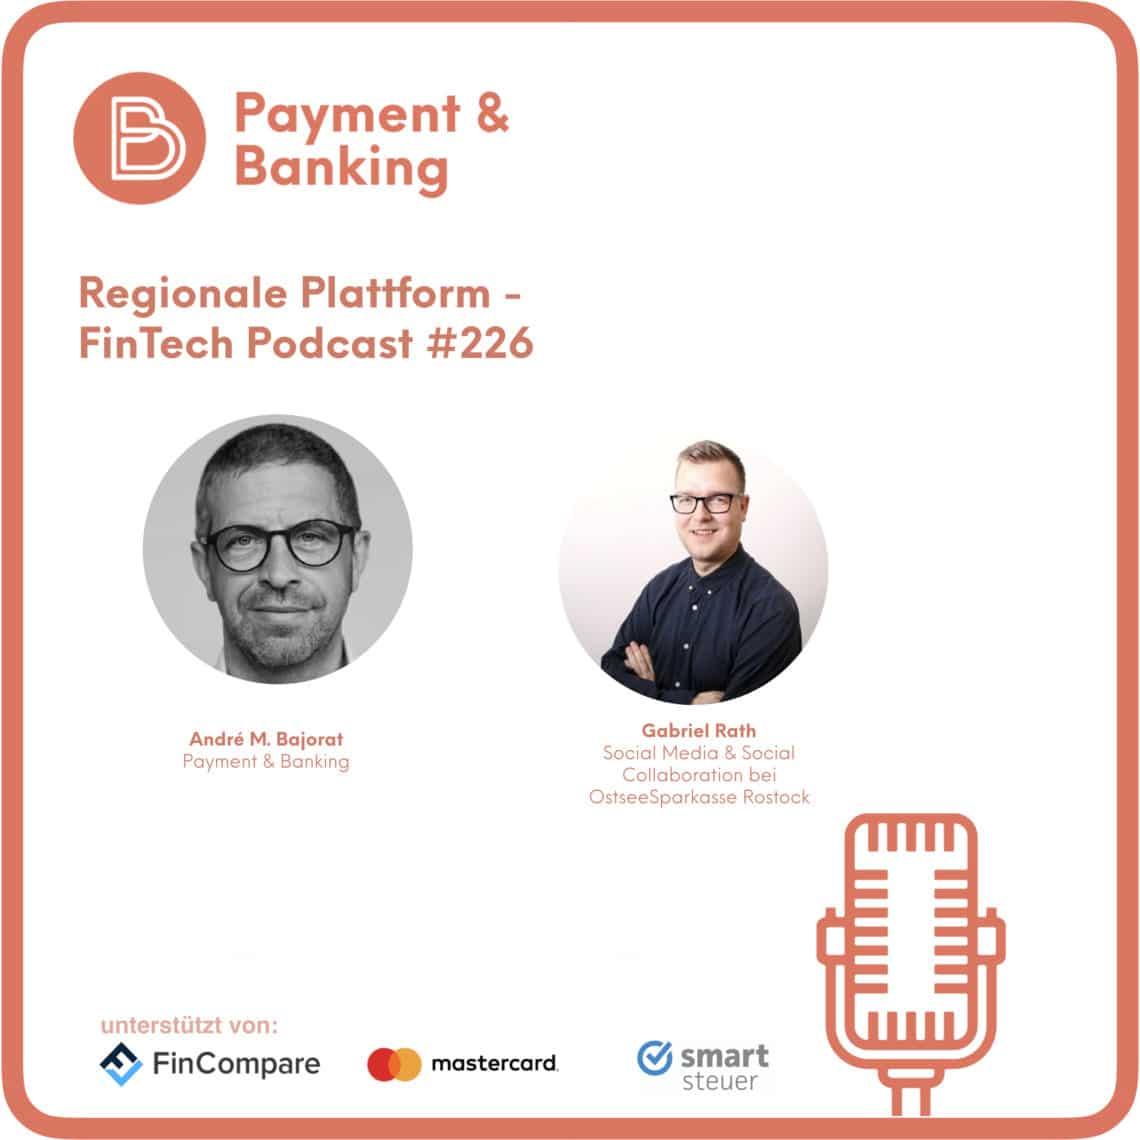 Regionale Plattform  - FinTech Podcast #226